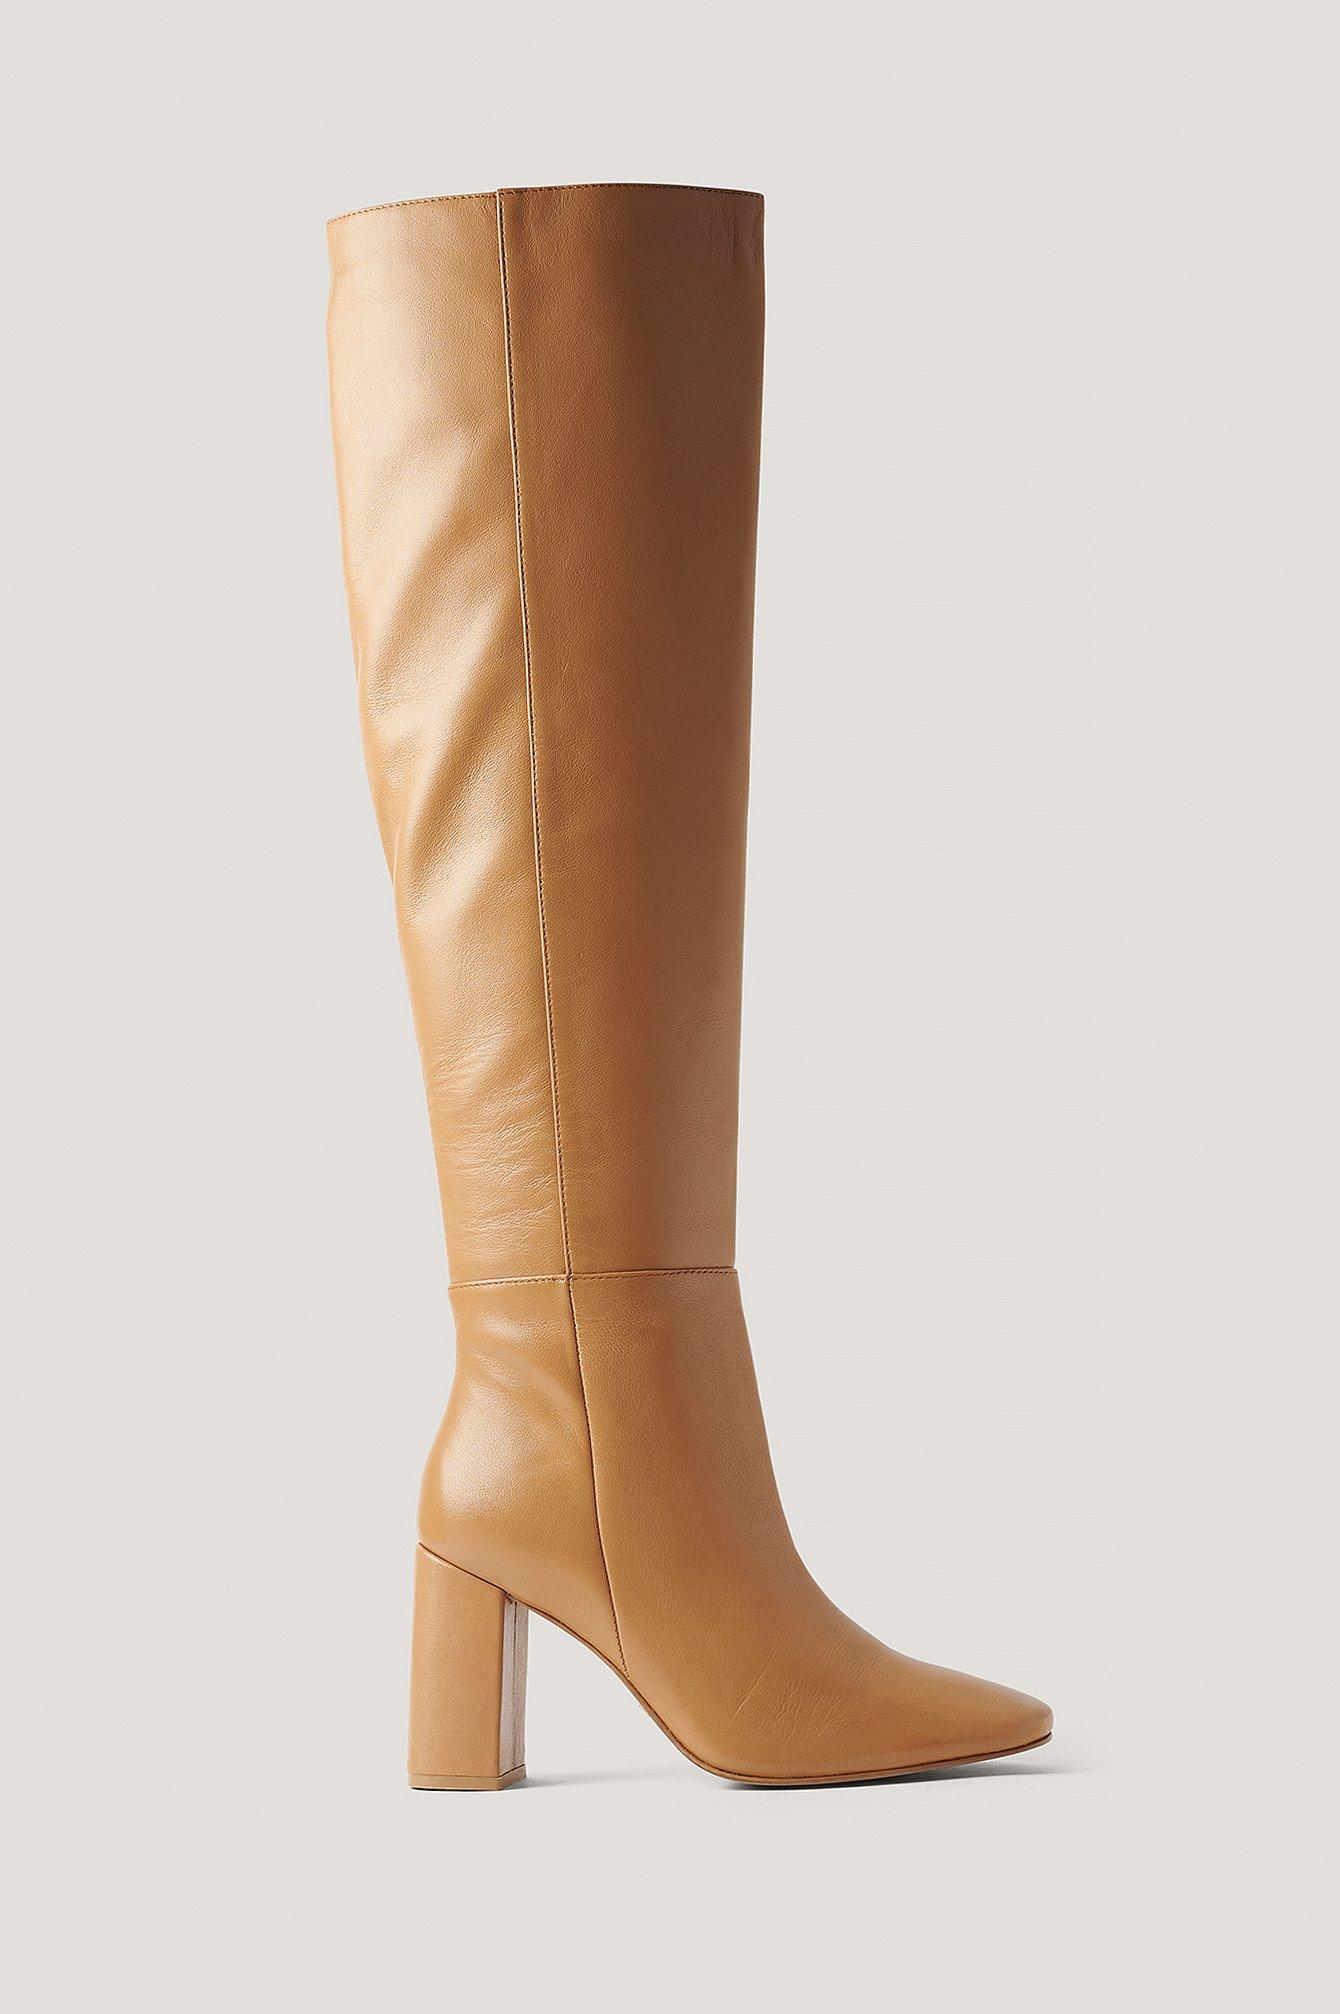 na-kd shoes -  Kniehohe Lederstiefel - Beige